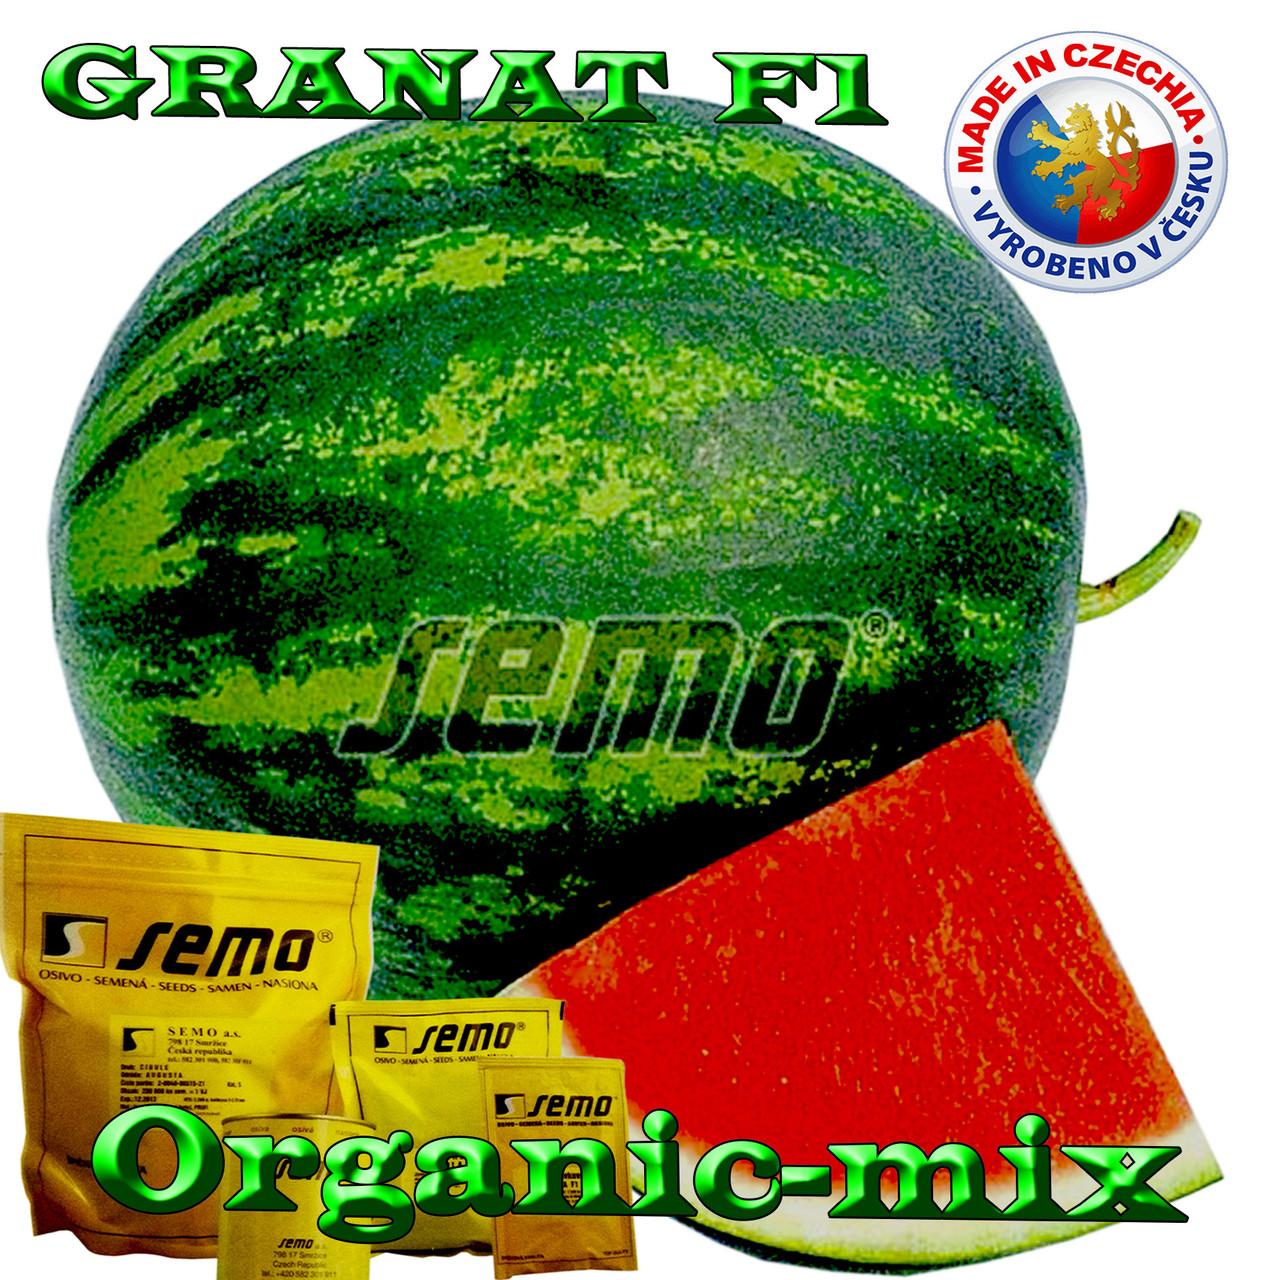 Семена, арбуз бессемянный, ГРАНАТ F1 / GRANAT F1, ТМ SEMO (Чехия) пакет 10 грамм (200 семян)